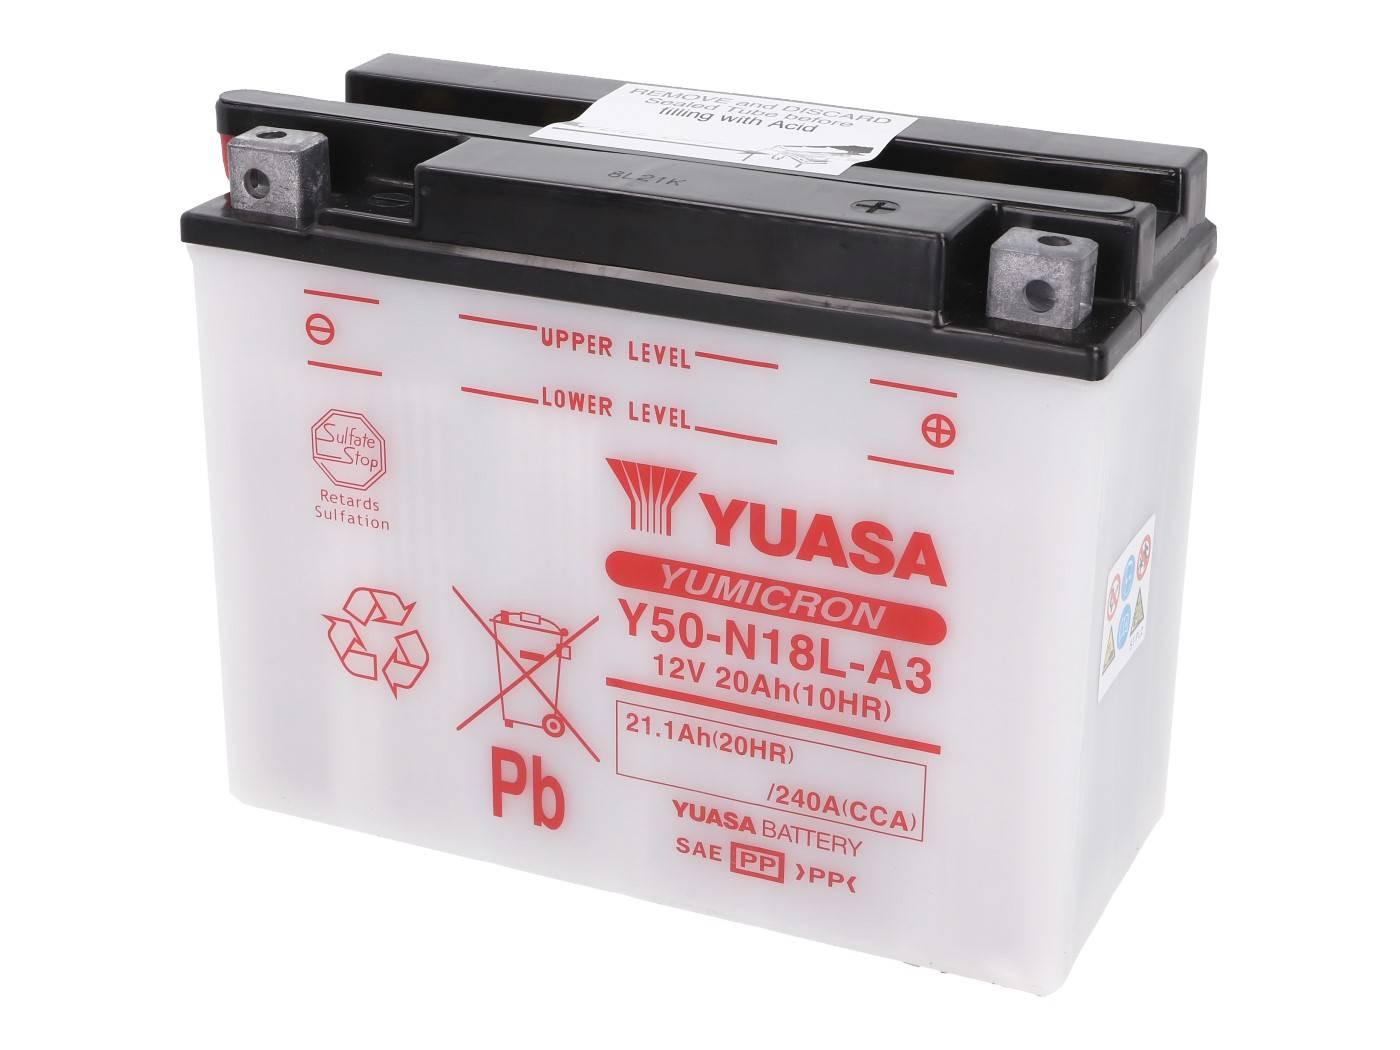 Yuasa YuMicron Y50-N18L-A3 akkumulátor - savcsomag nélkül